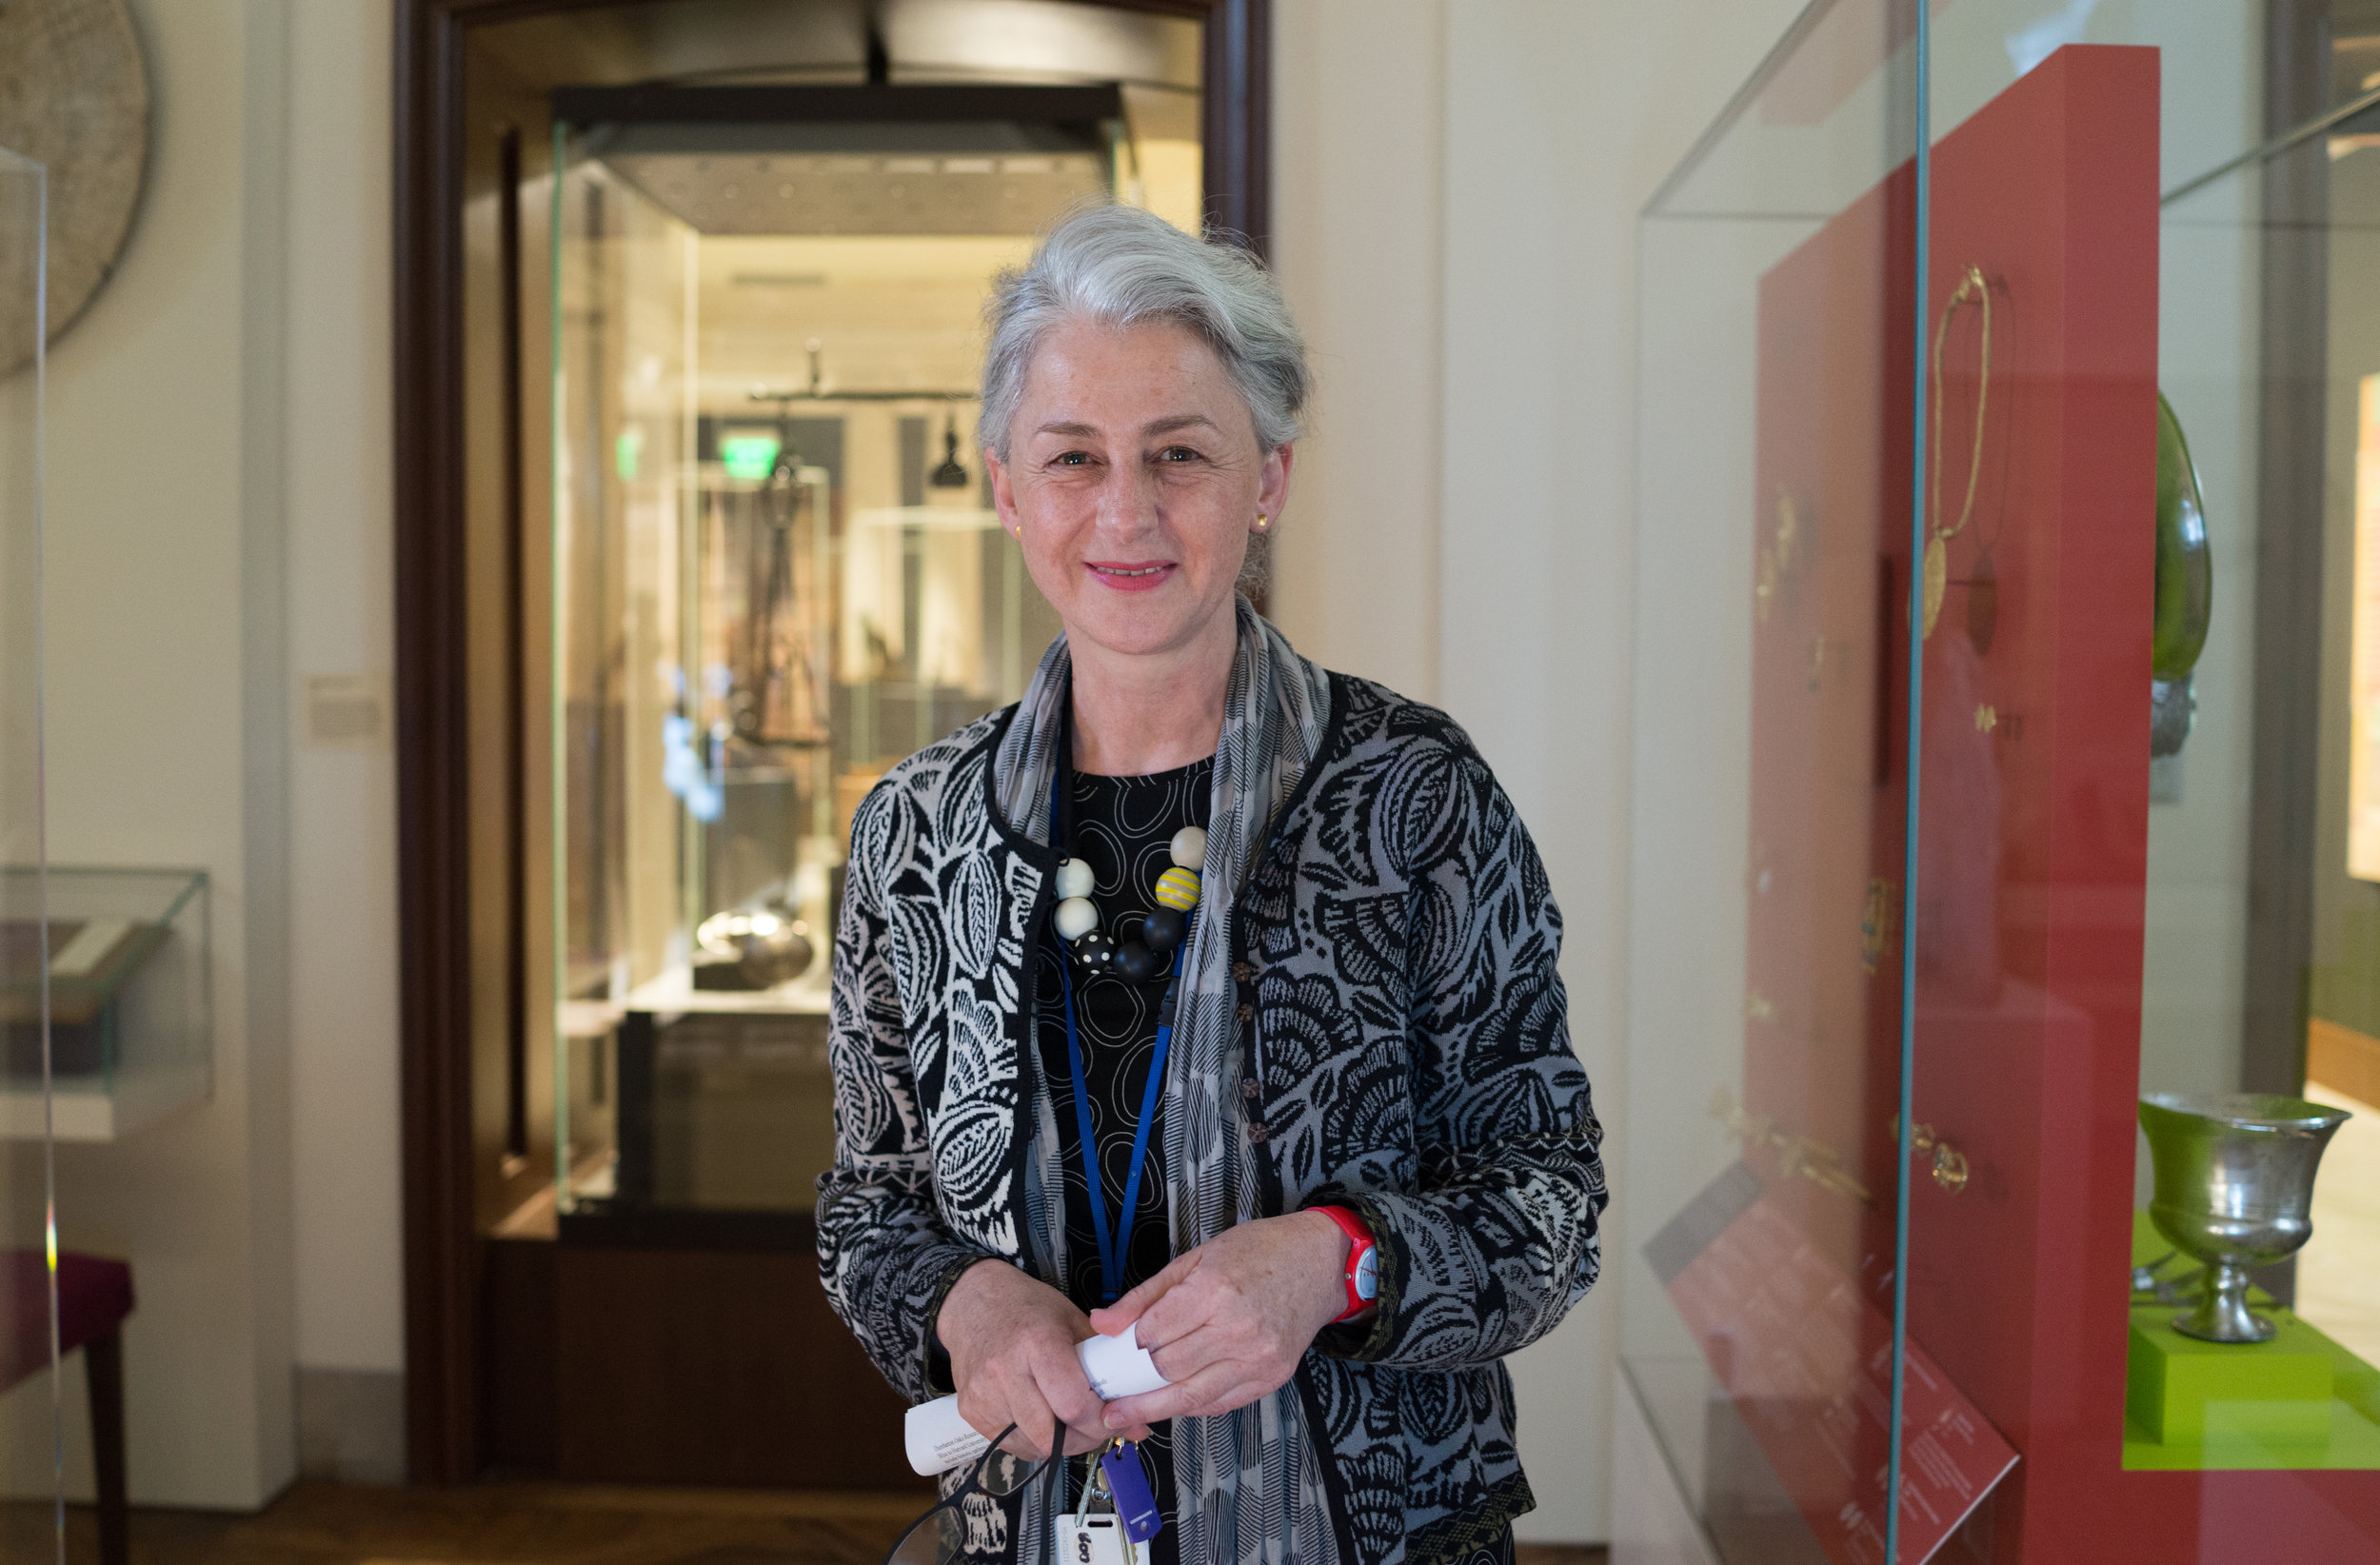 Museum Director and Curator - Gudurn Buel